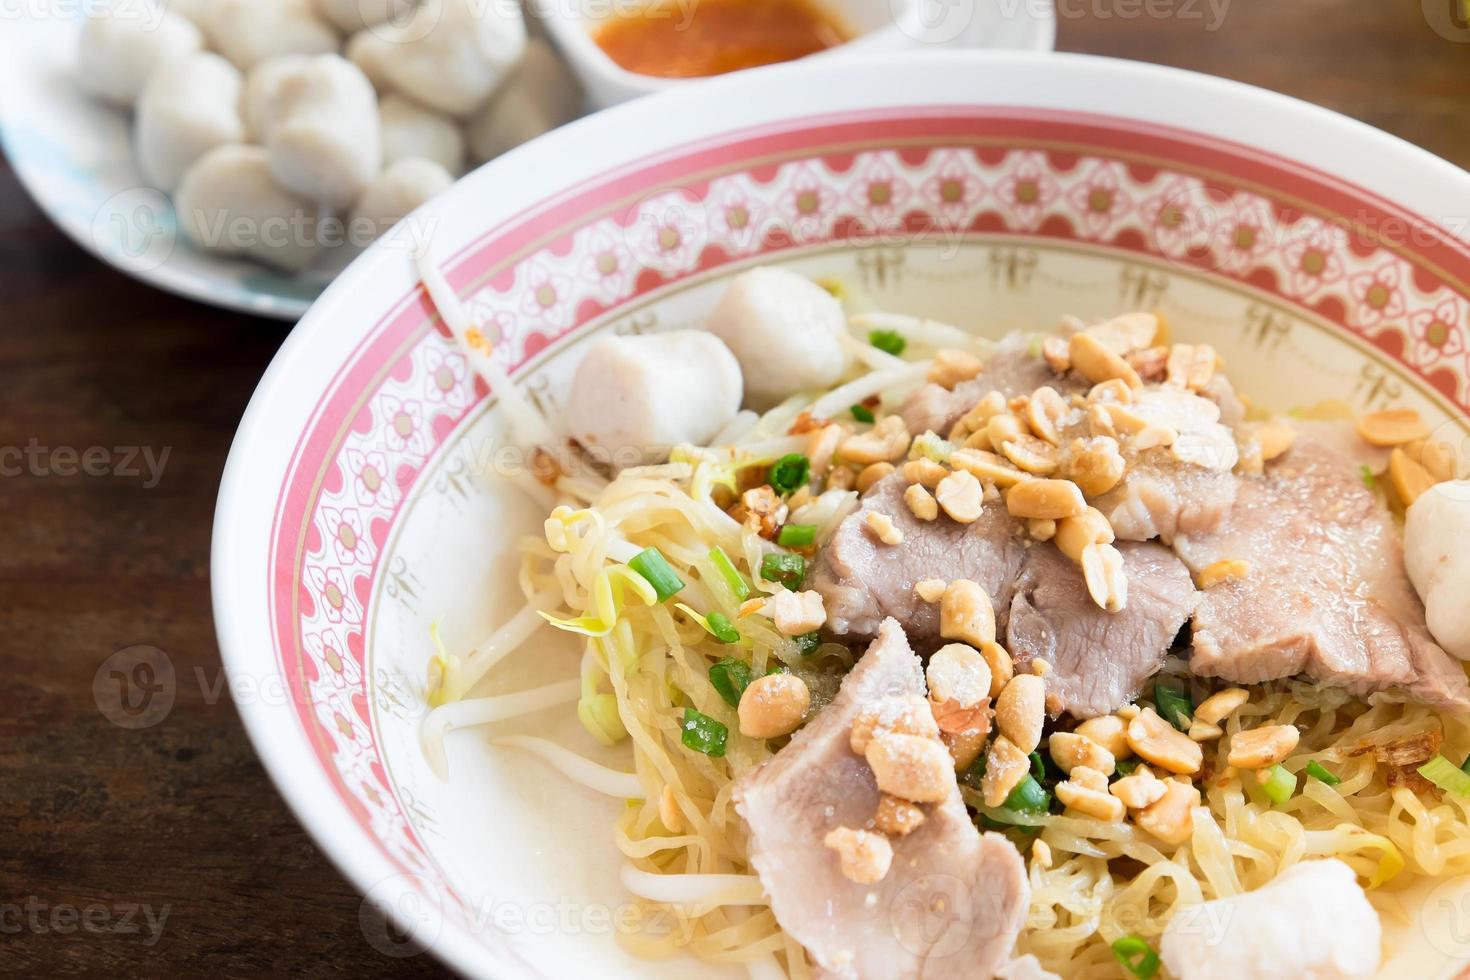 Egg Noodles Soup with Fish Balls photo